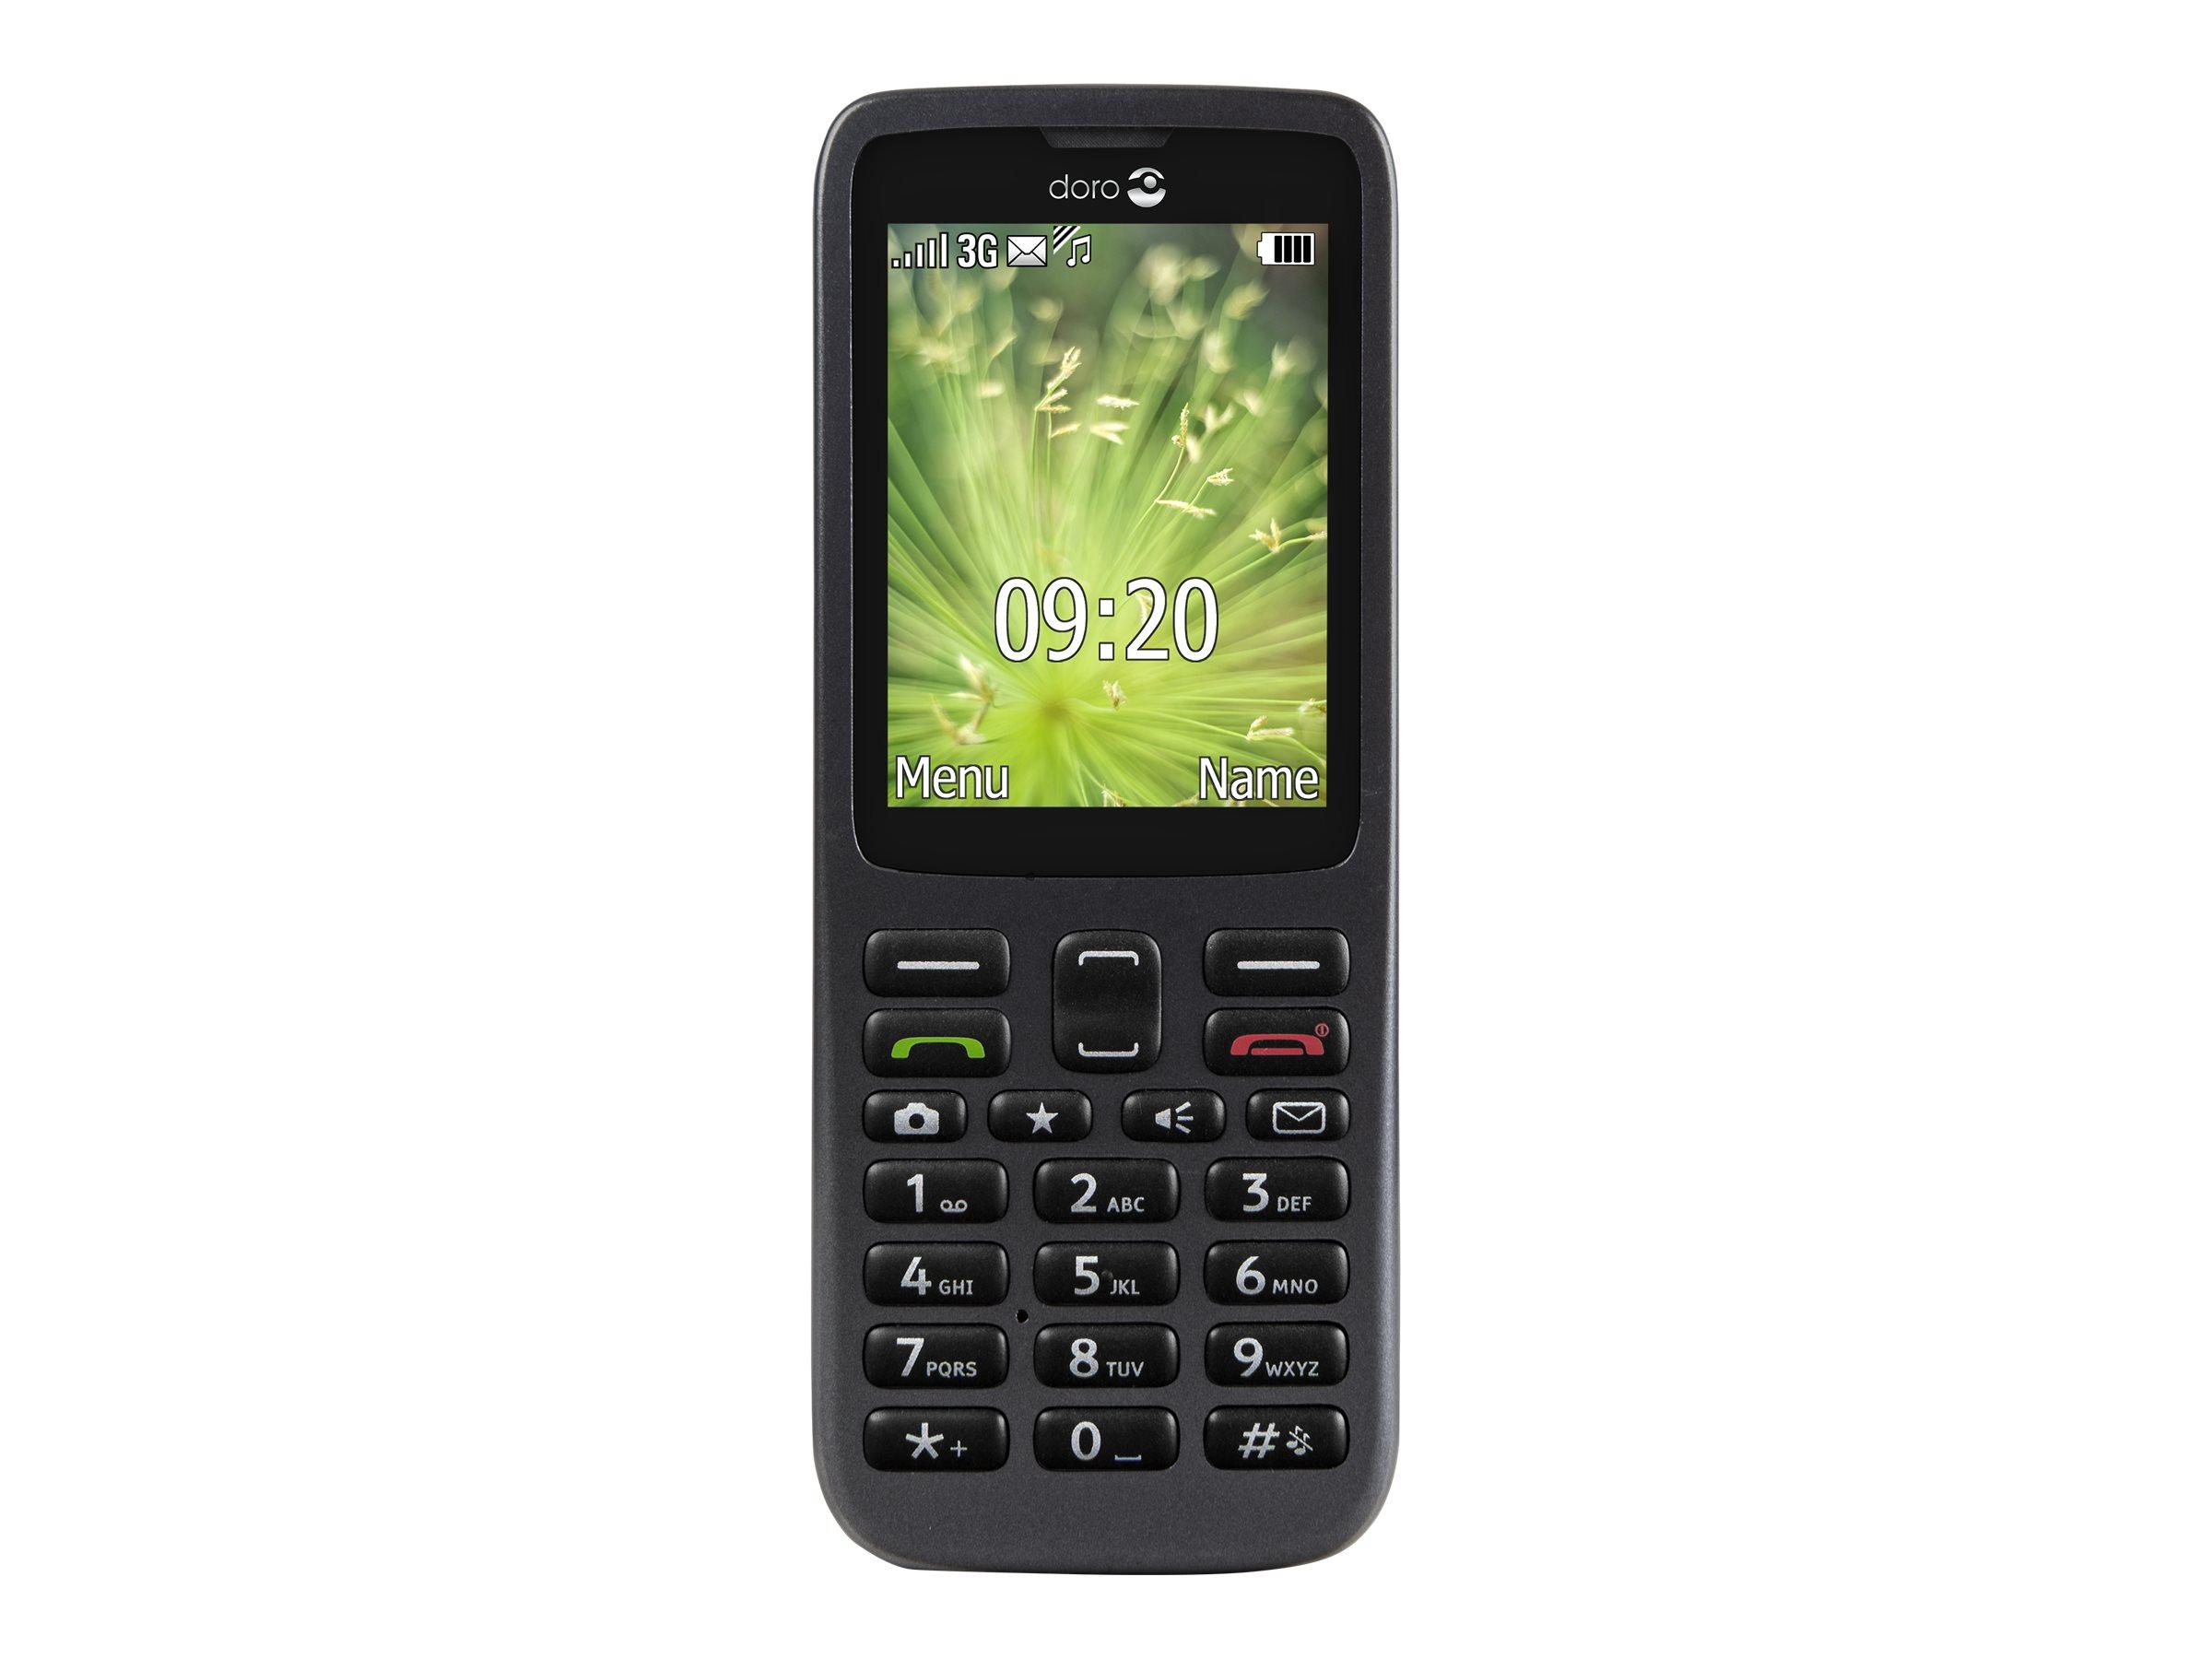 Doro 5516 - Mobiltelefon - 3G - microSDHC slot - GSM - 320 x 240 Pixel